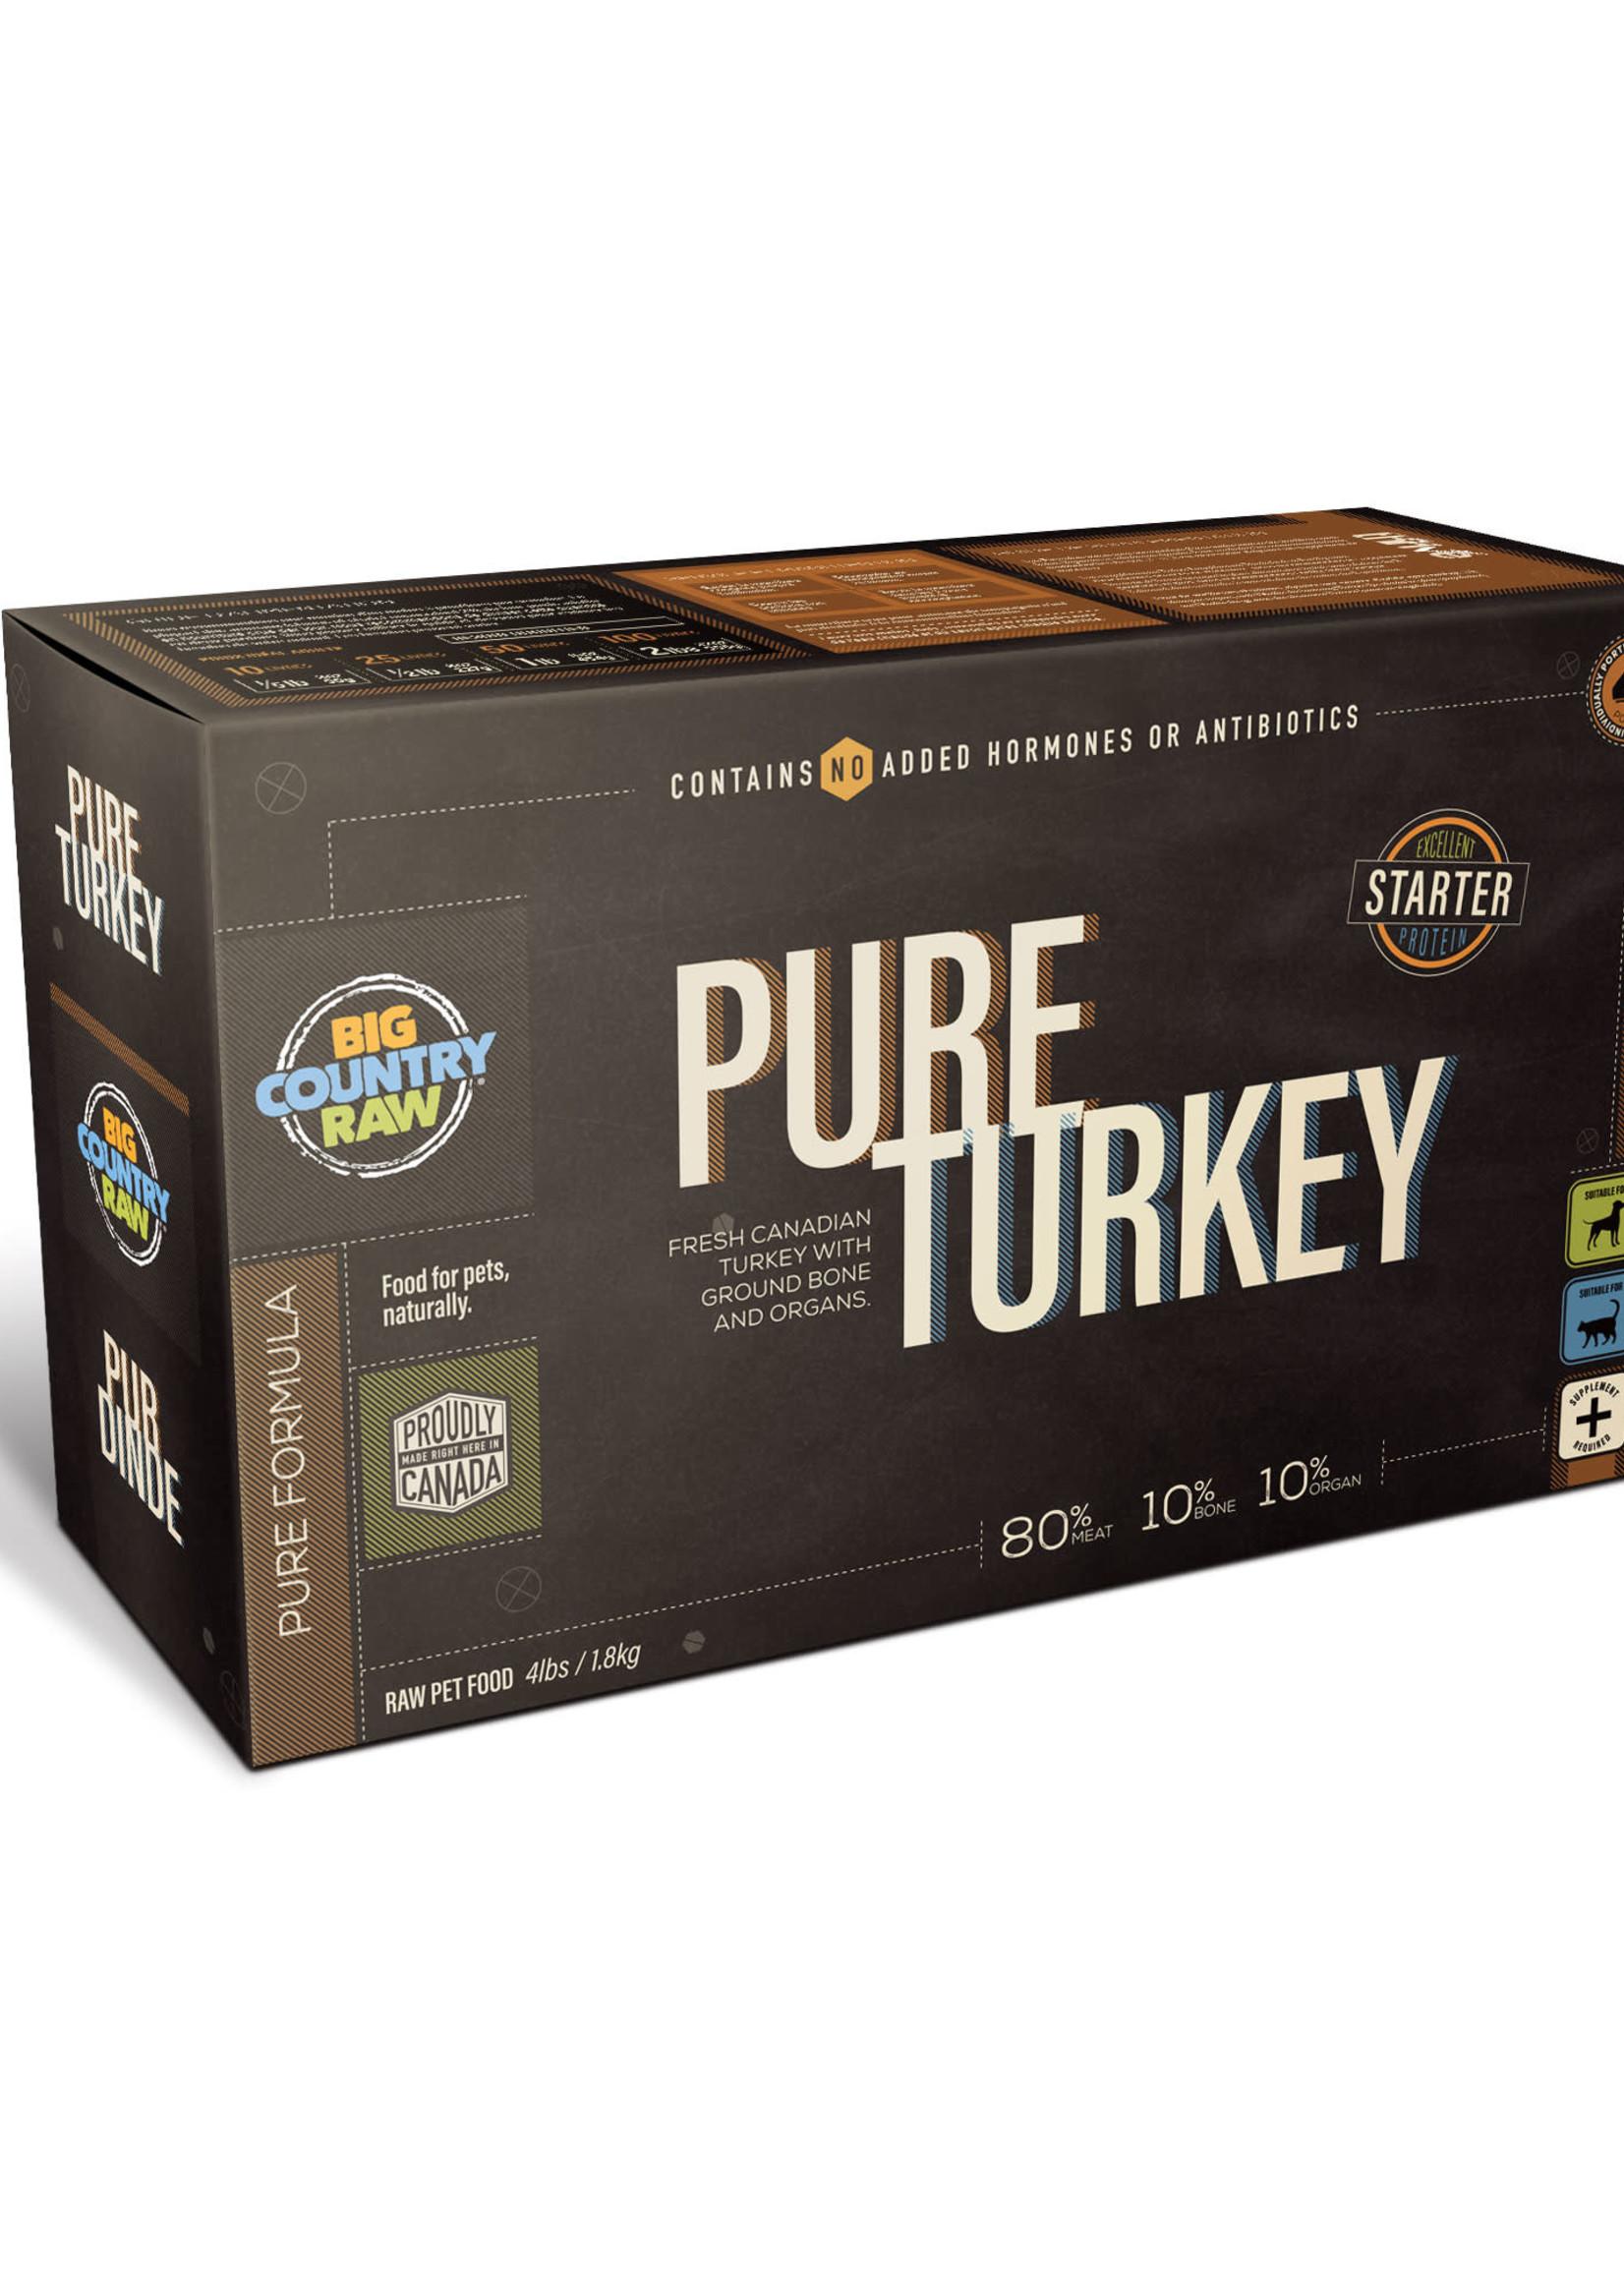 Big Country Raw Big Country Raw Pure Turkey 4x1lb